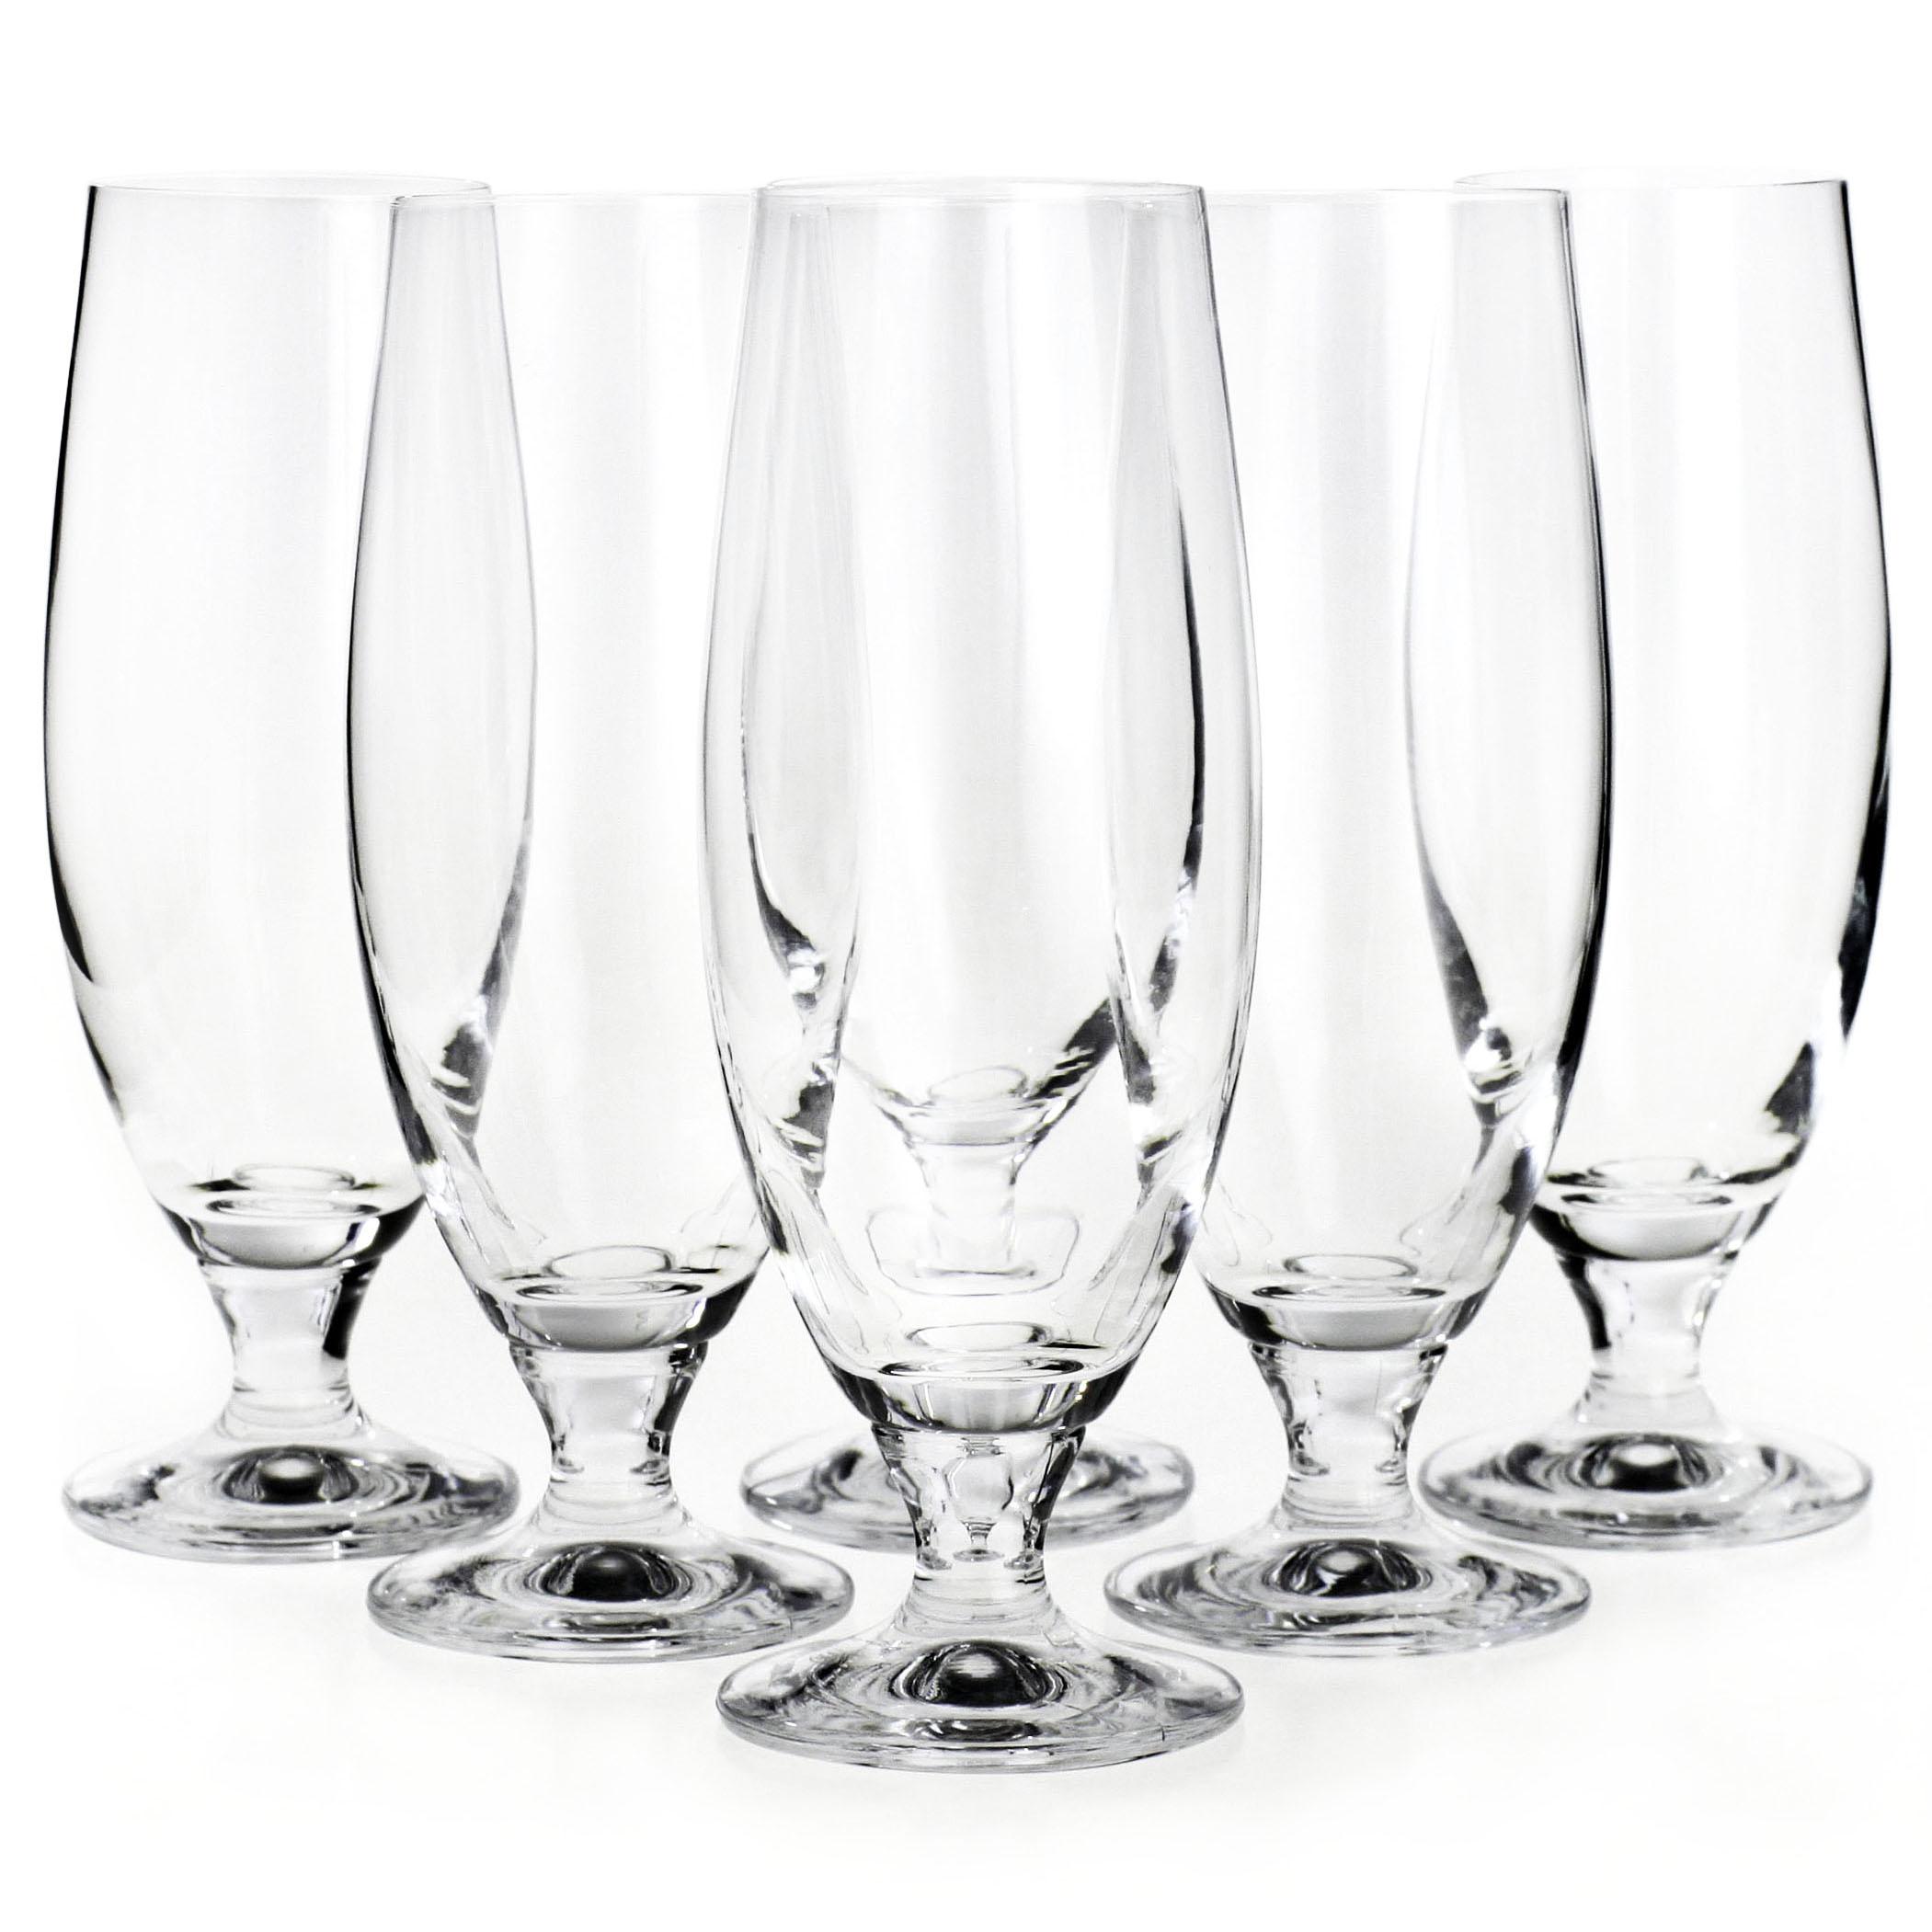 Pretrepte pivné okuliare Krosno Prestige 500 ml